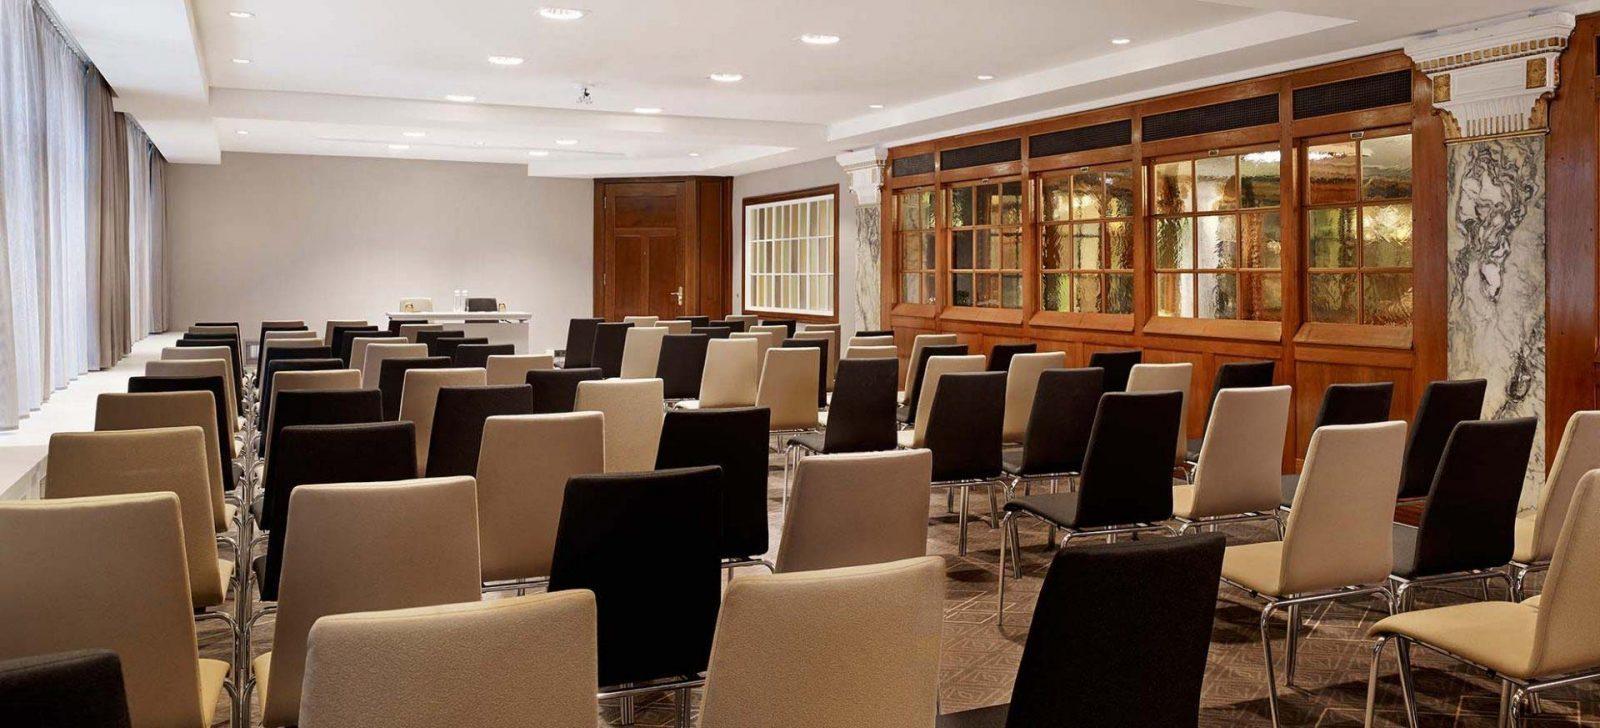 Reichshof Hotel Hamburg Tagungsraum / Meeting room